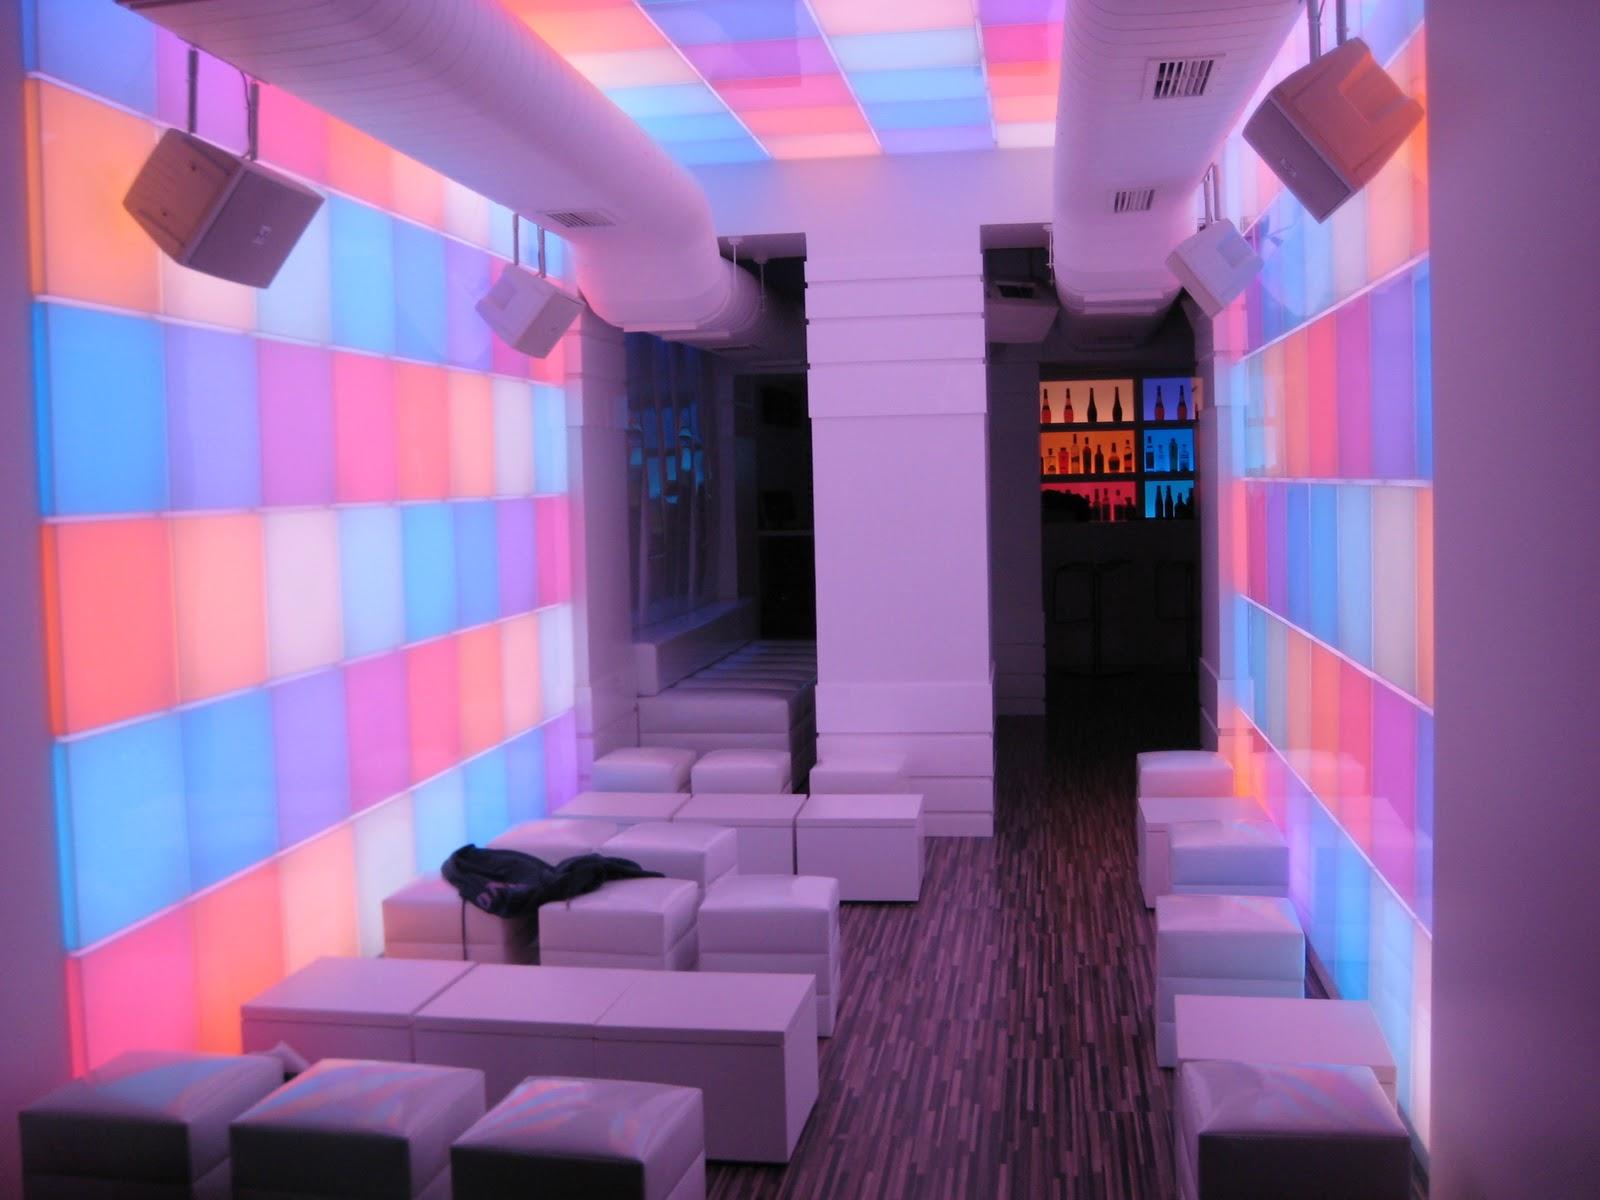 Ebled iluminacion pub stromboli madrid instalaci n - Iluminacion por leds ...